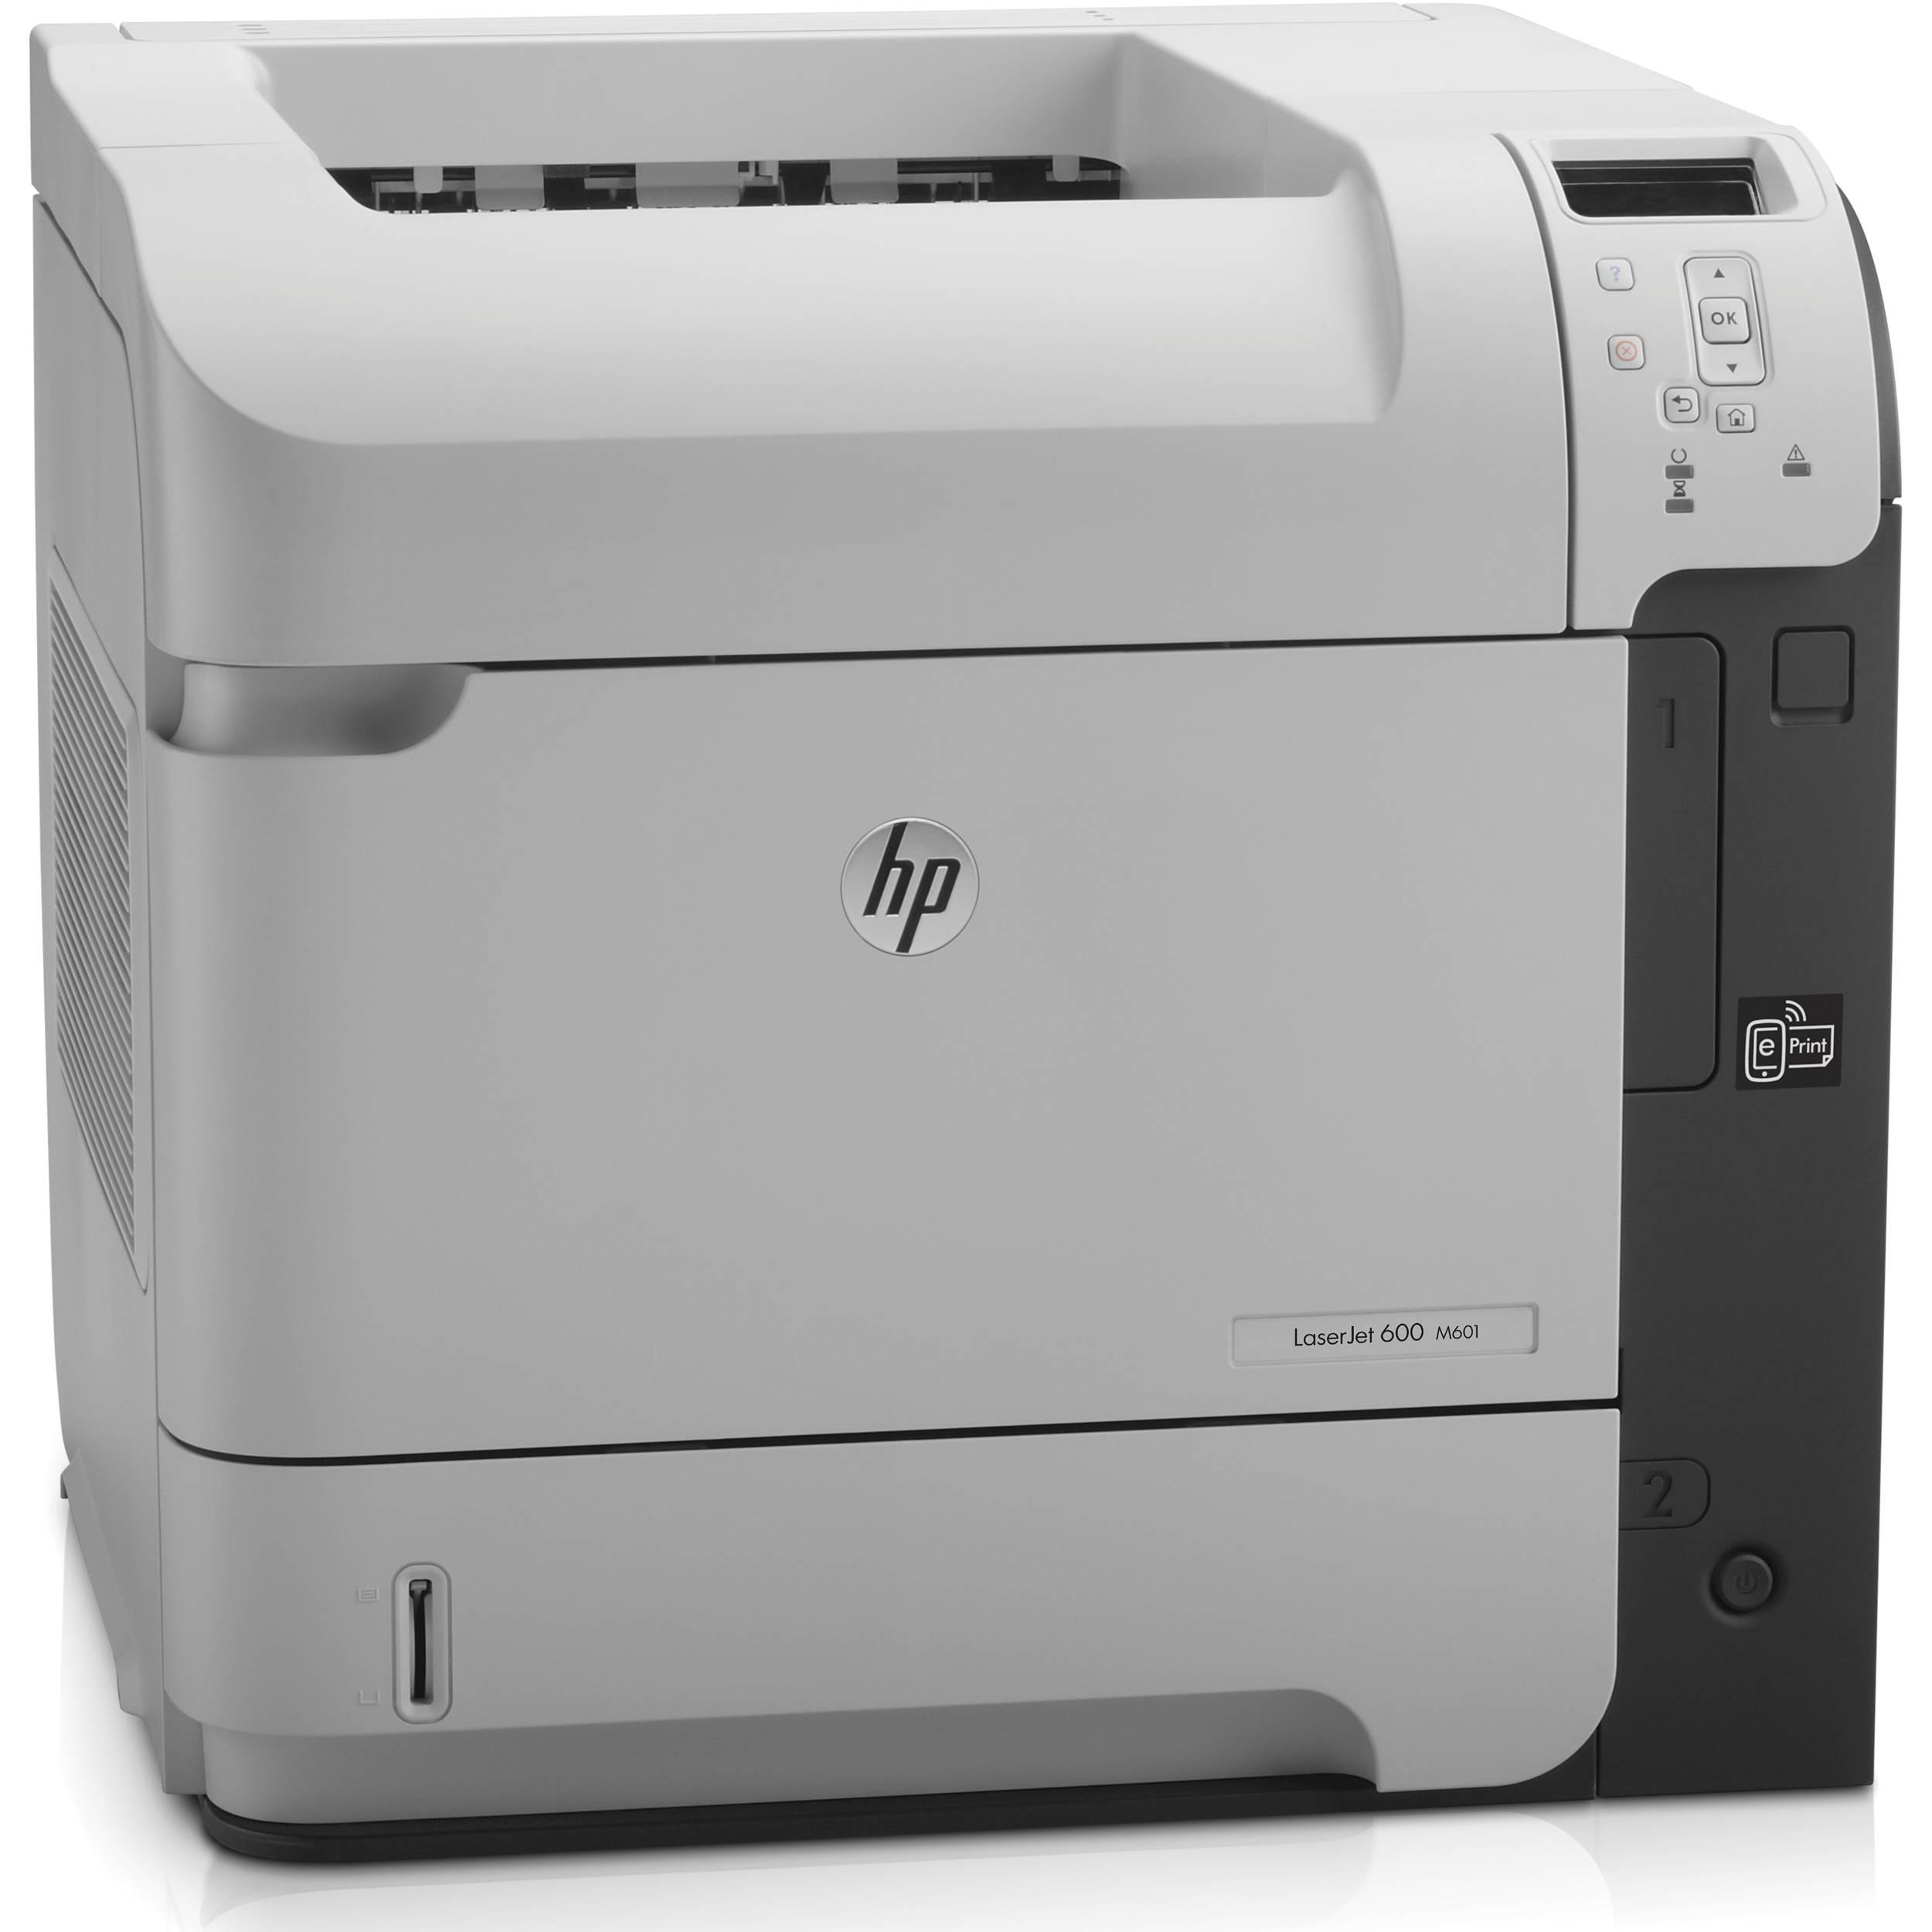 AIM Refurbish - LaserJet Enterprise 600 M601DN Laser Printer (AIMCE990A)